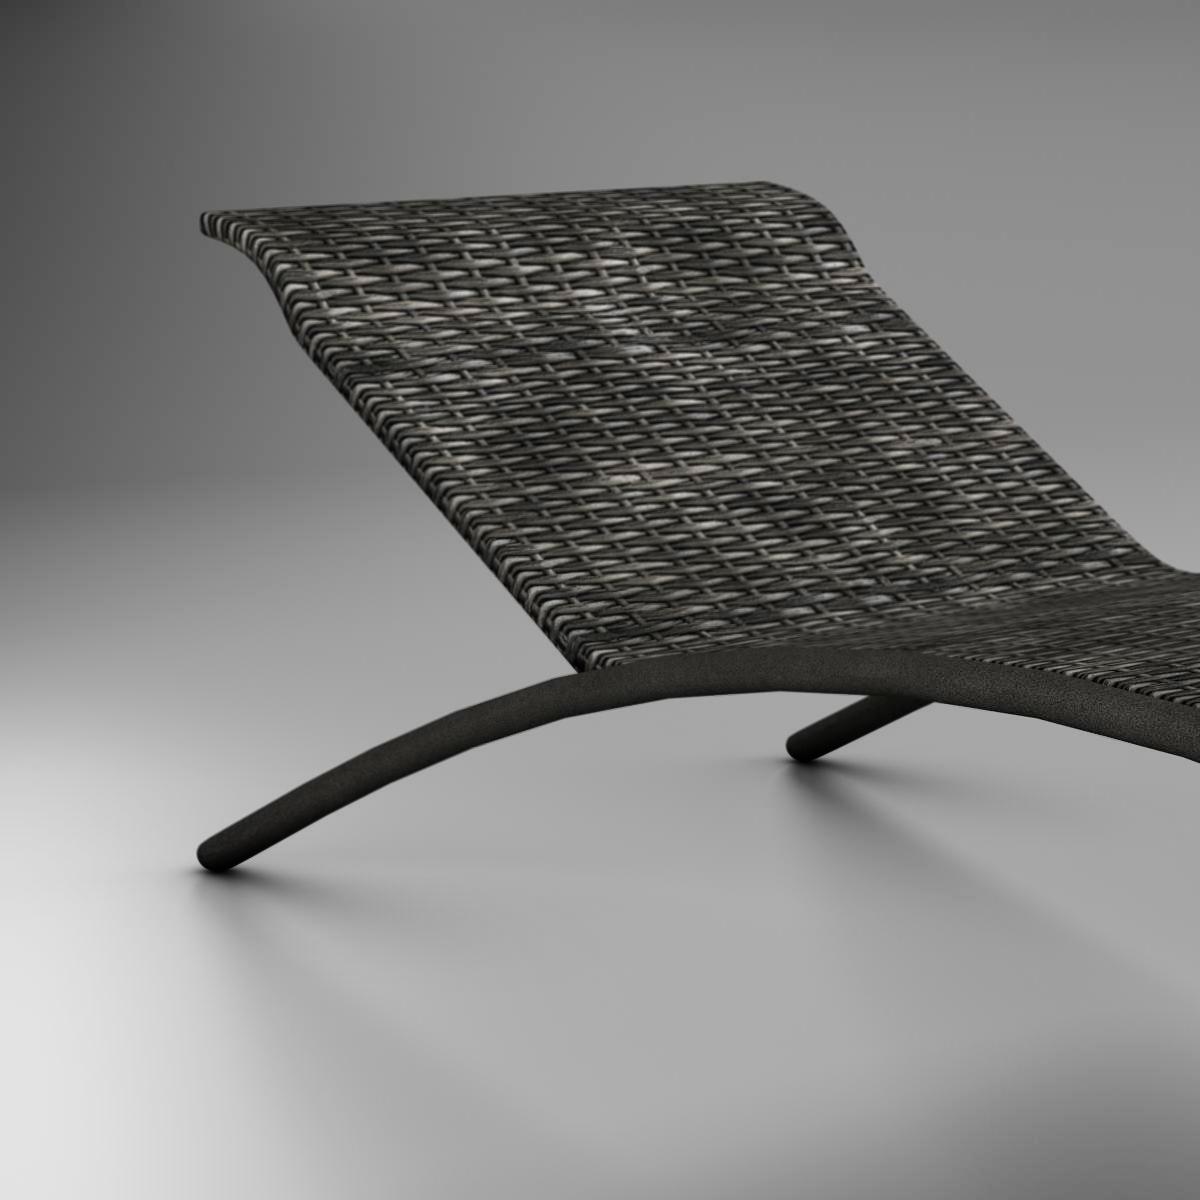 sunbed chair 3d model 3ds max fbx c4d ma mb obj 162644